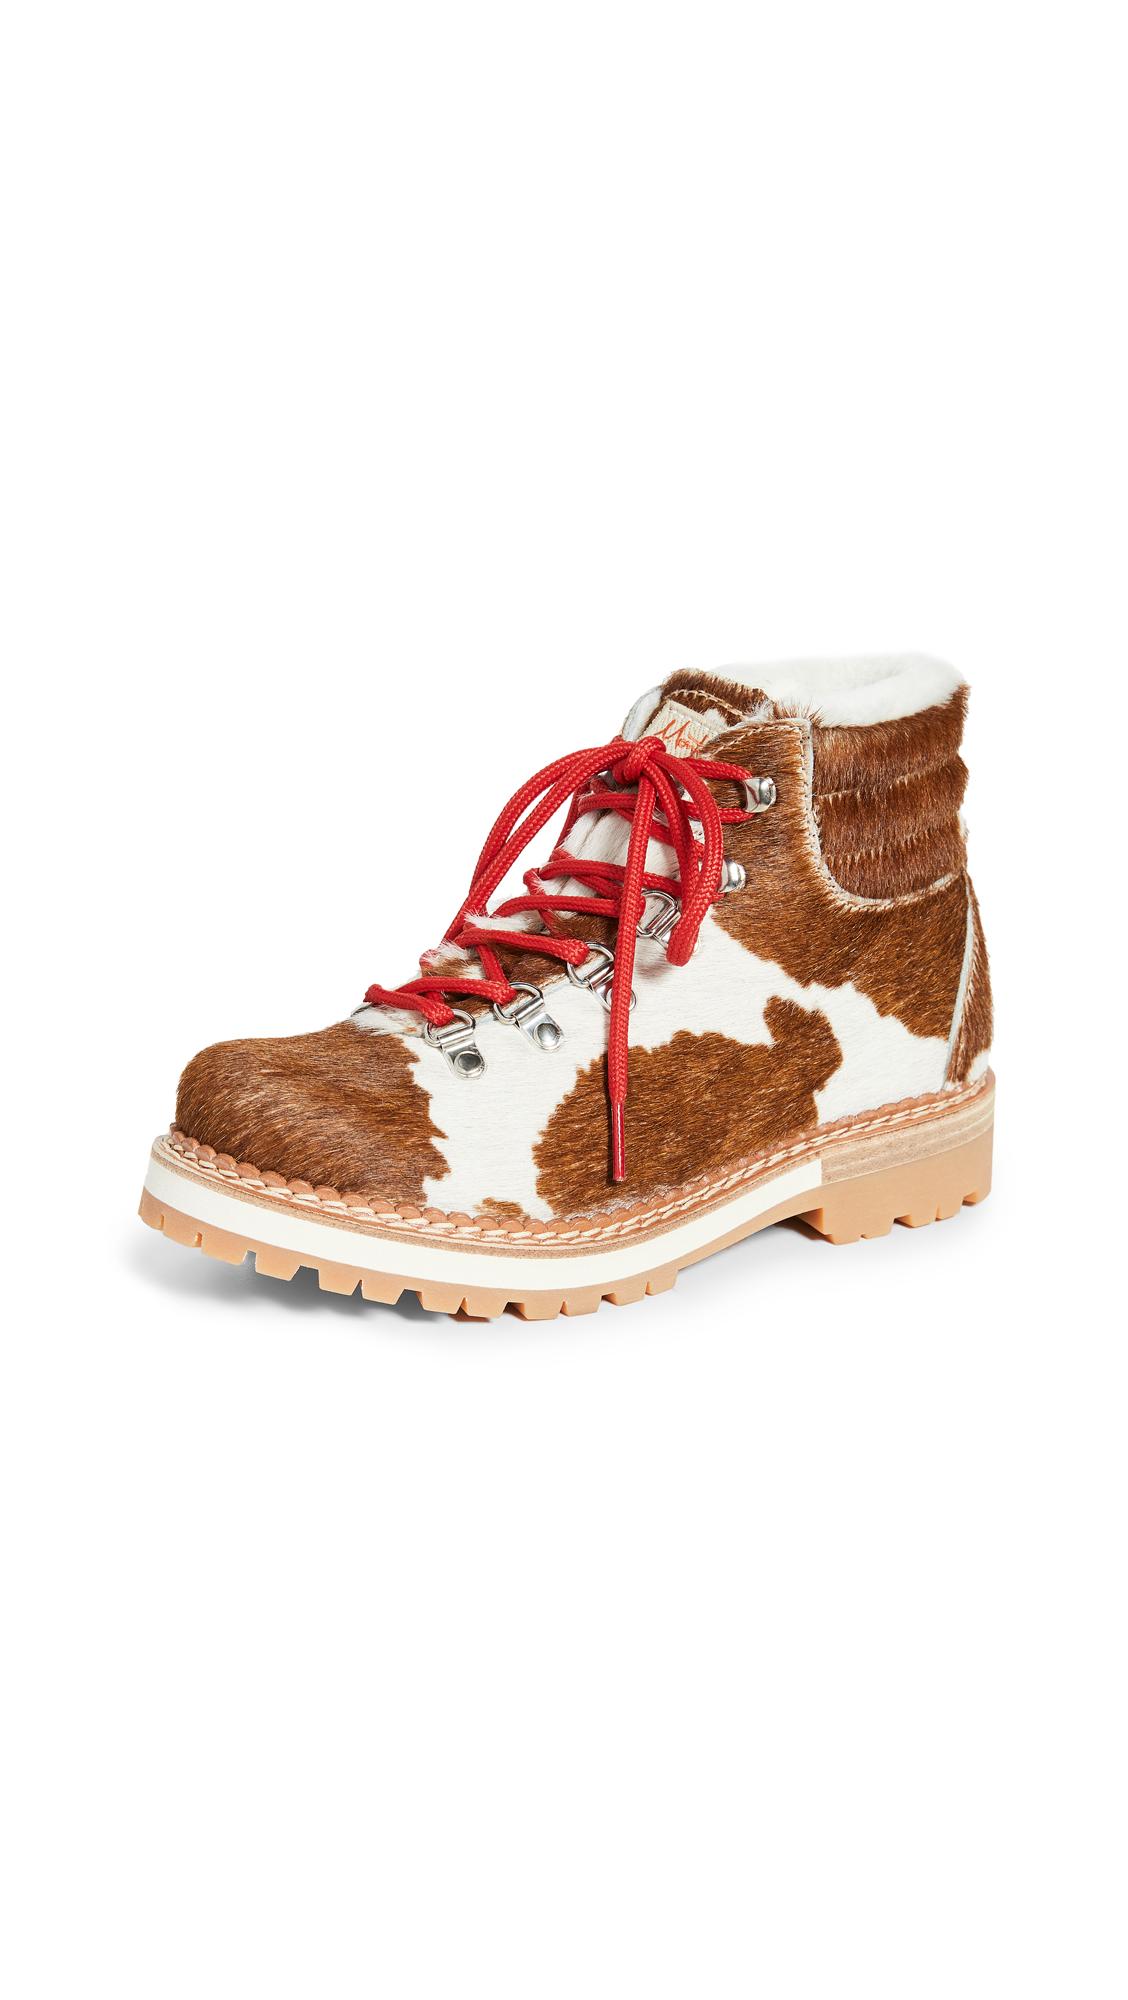 Montelliana Marlena Boots - 70% Off Sale